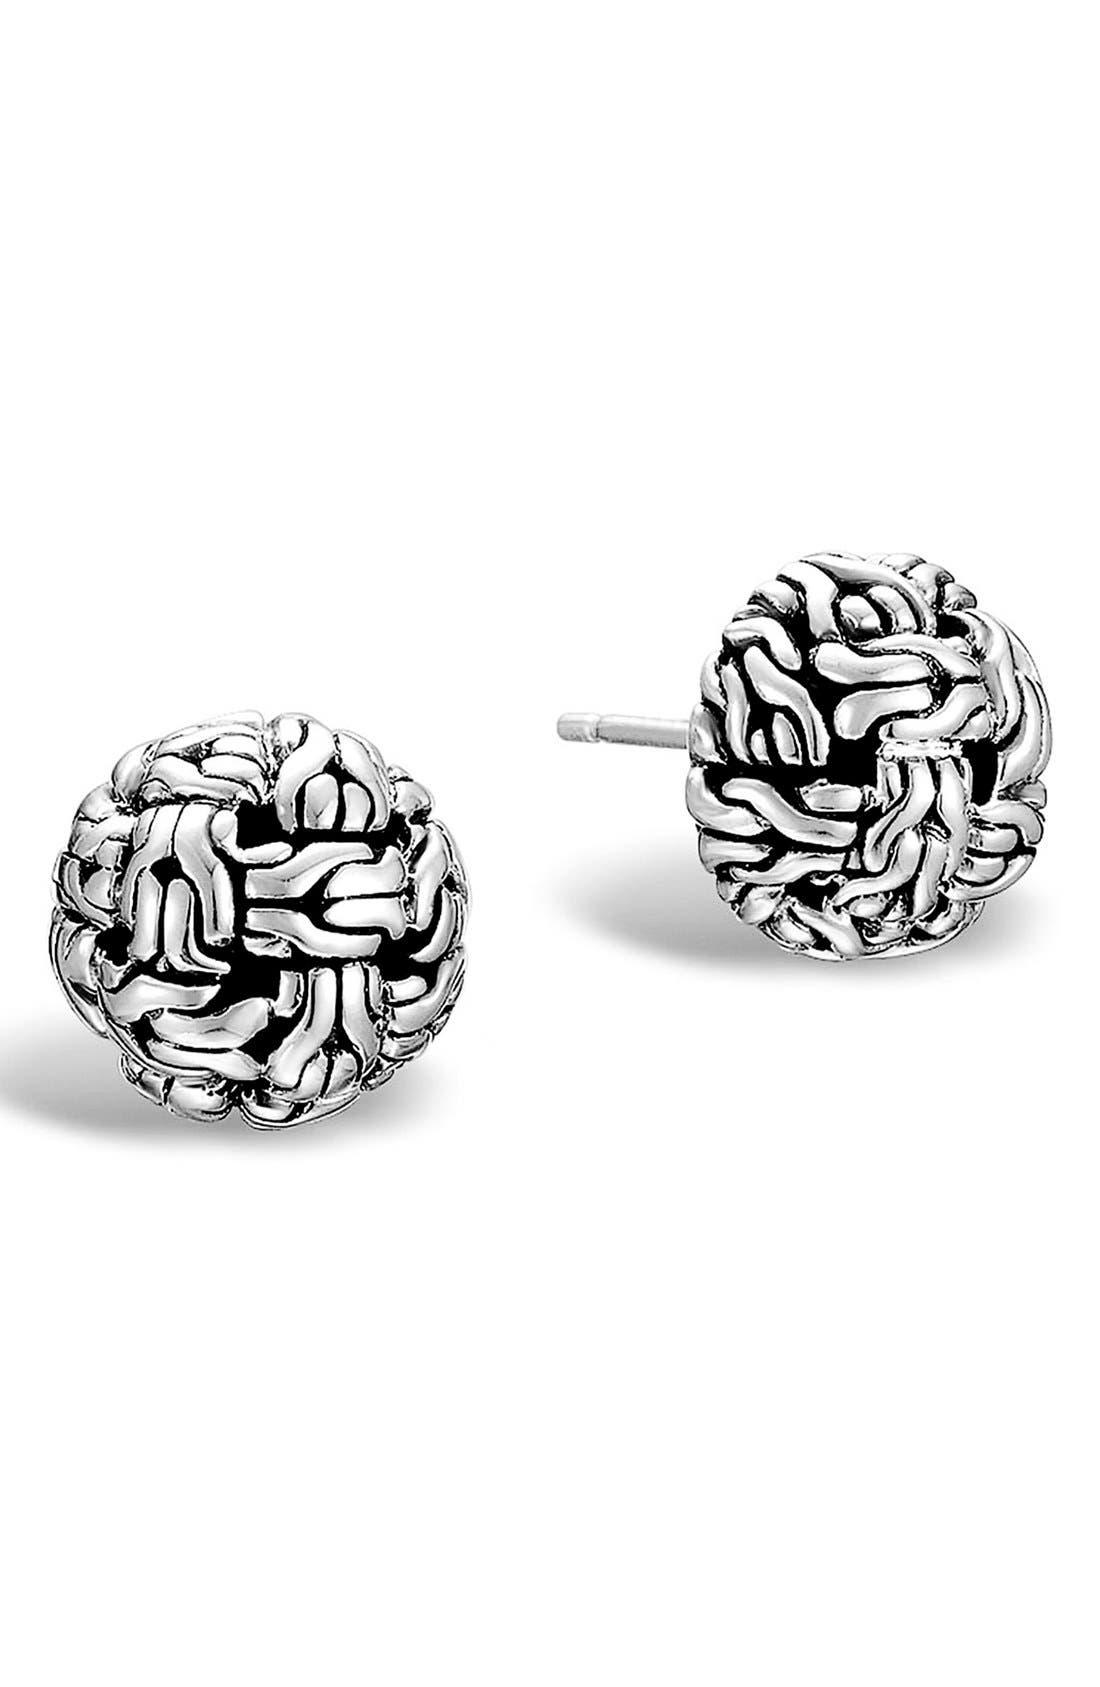 Main Image - John Hardy 'Classic Chain' Stud Earrings